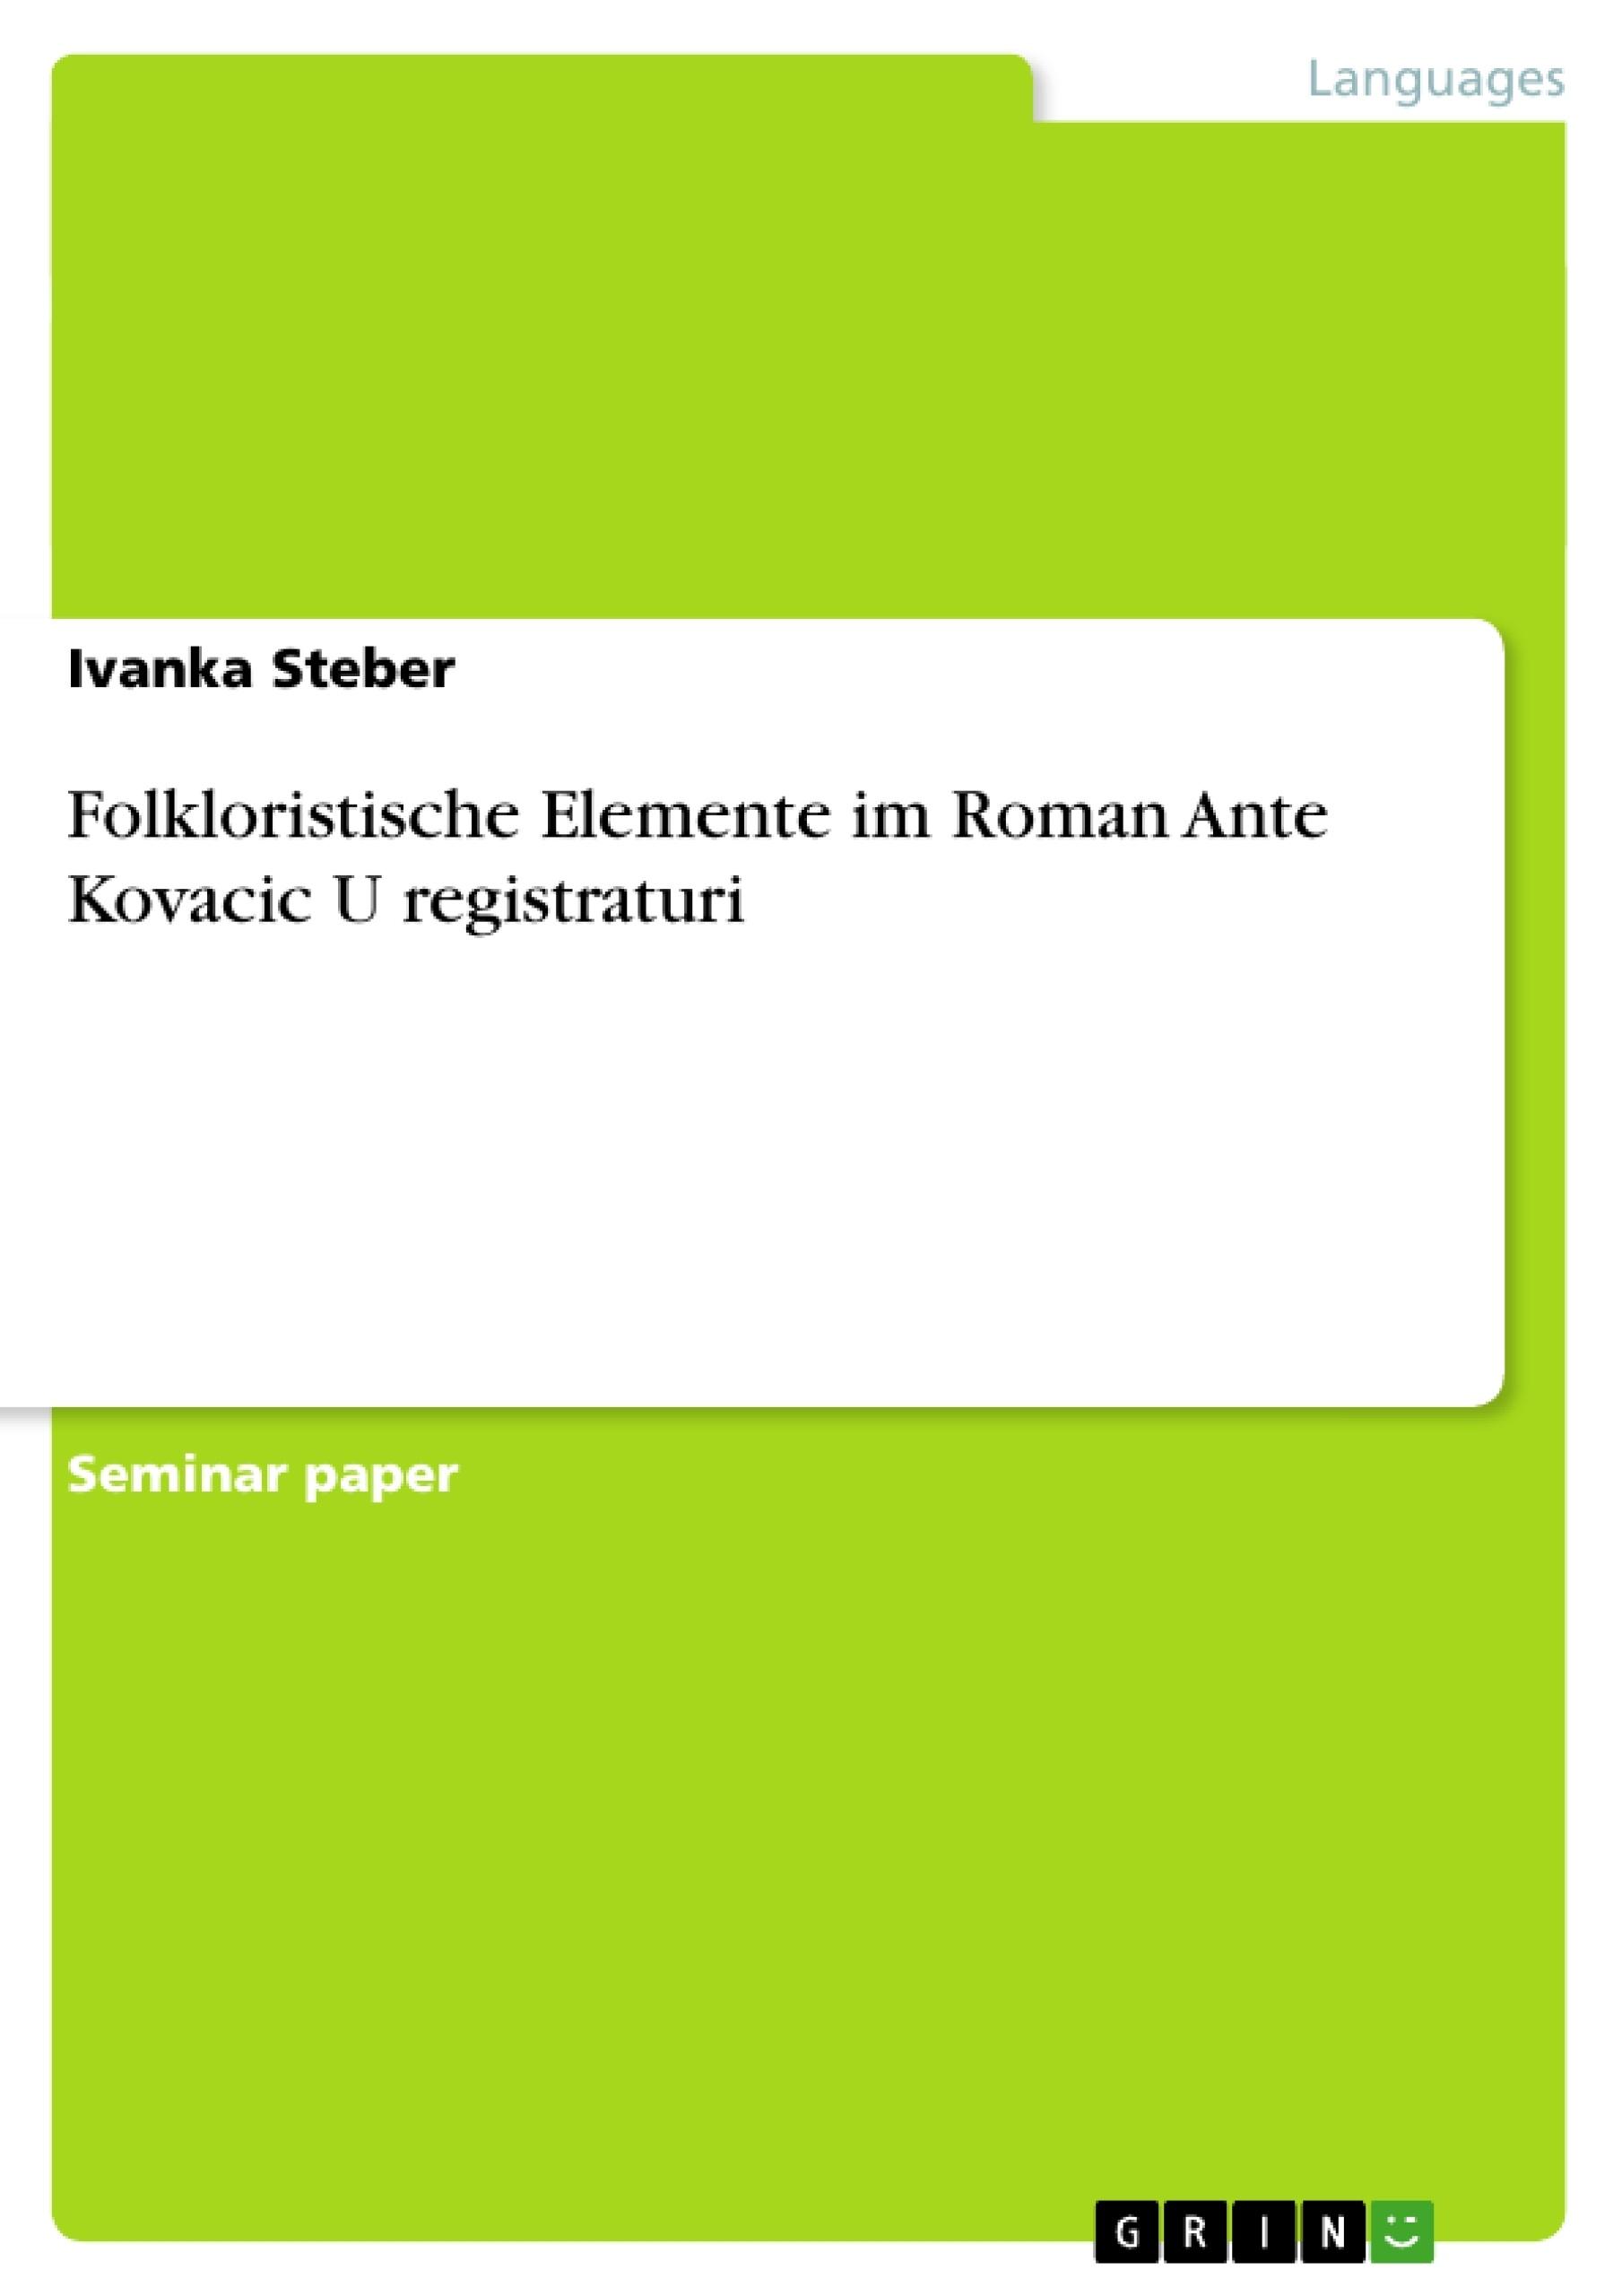 Title: Folkloristische Elemente im Roman Ante Kovacic  U registraturi